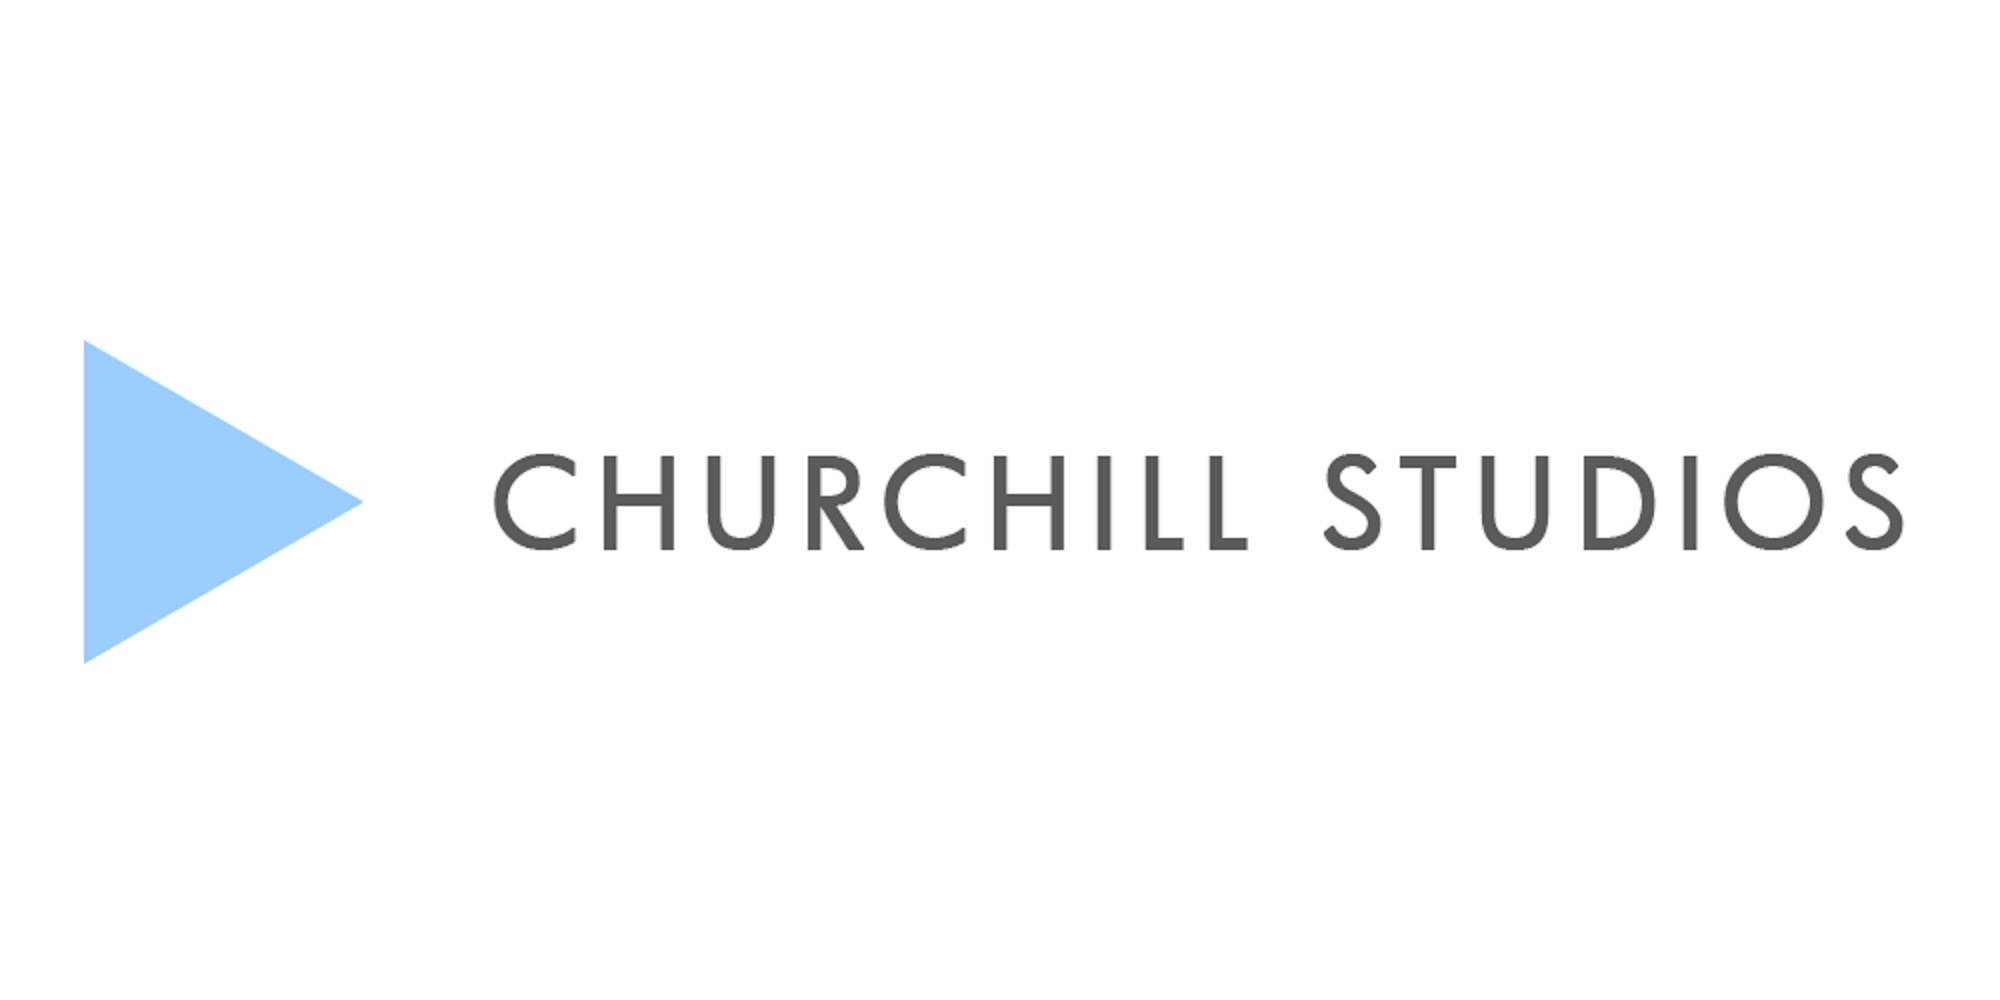 Churchill Studios